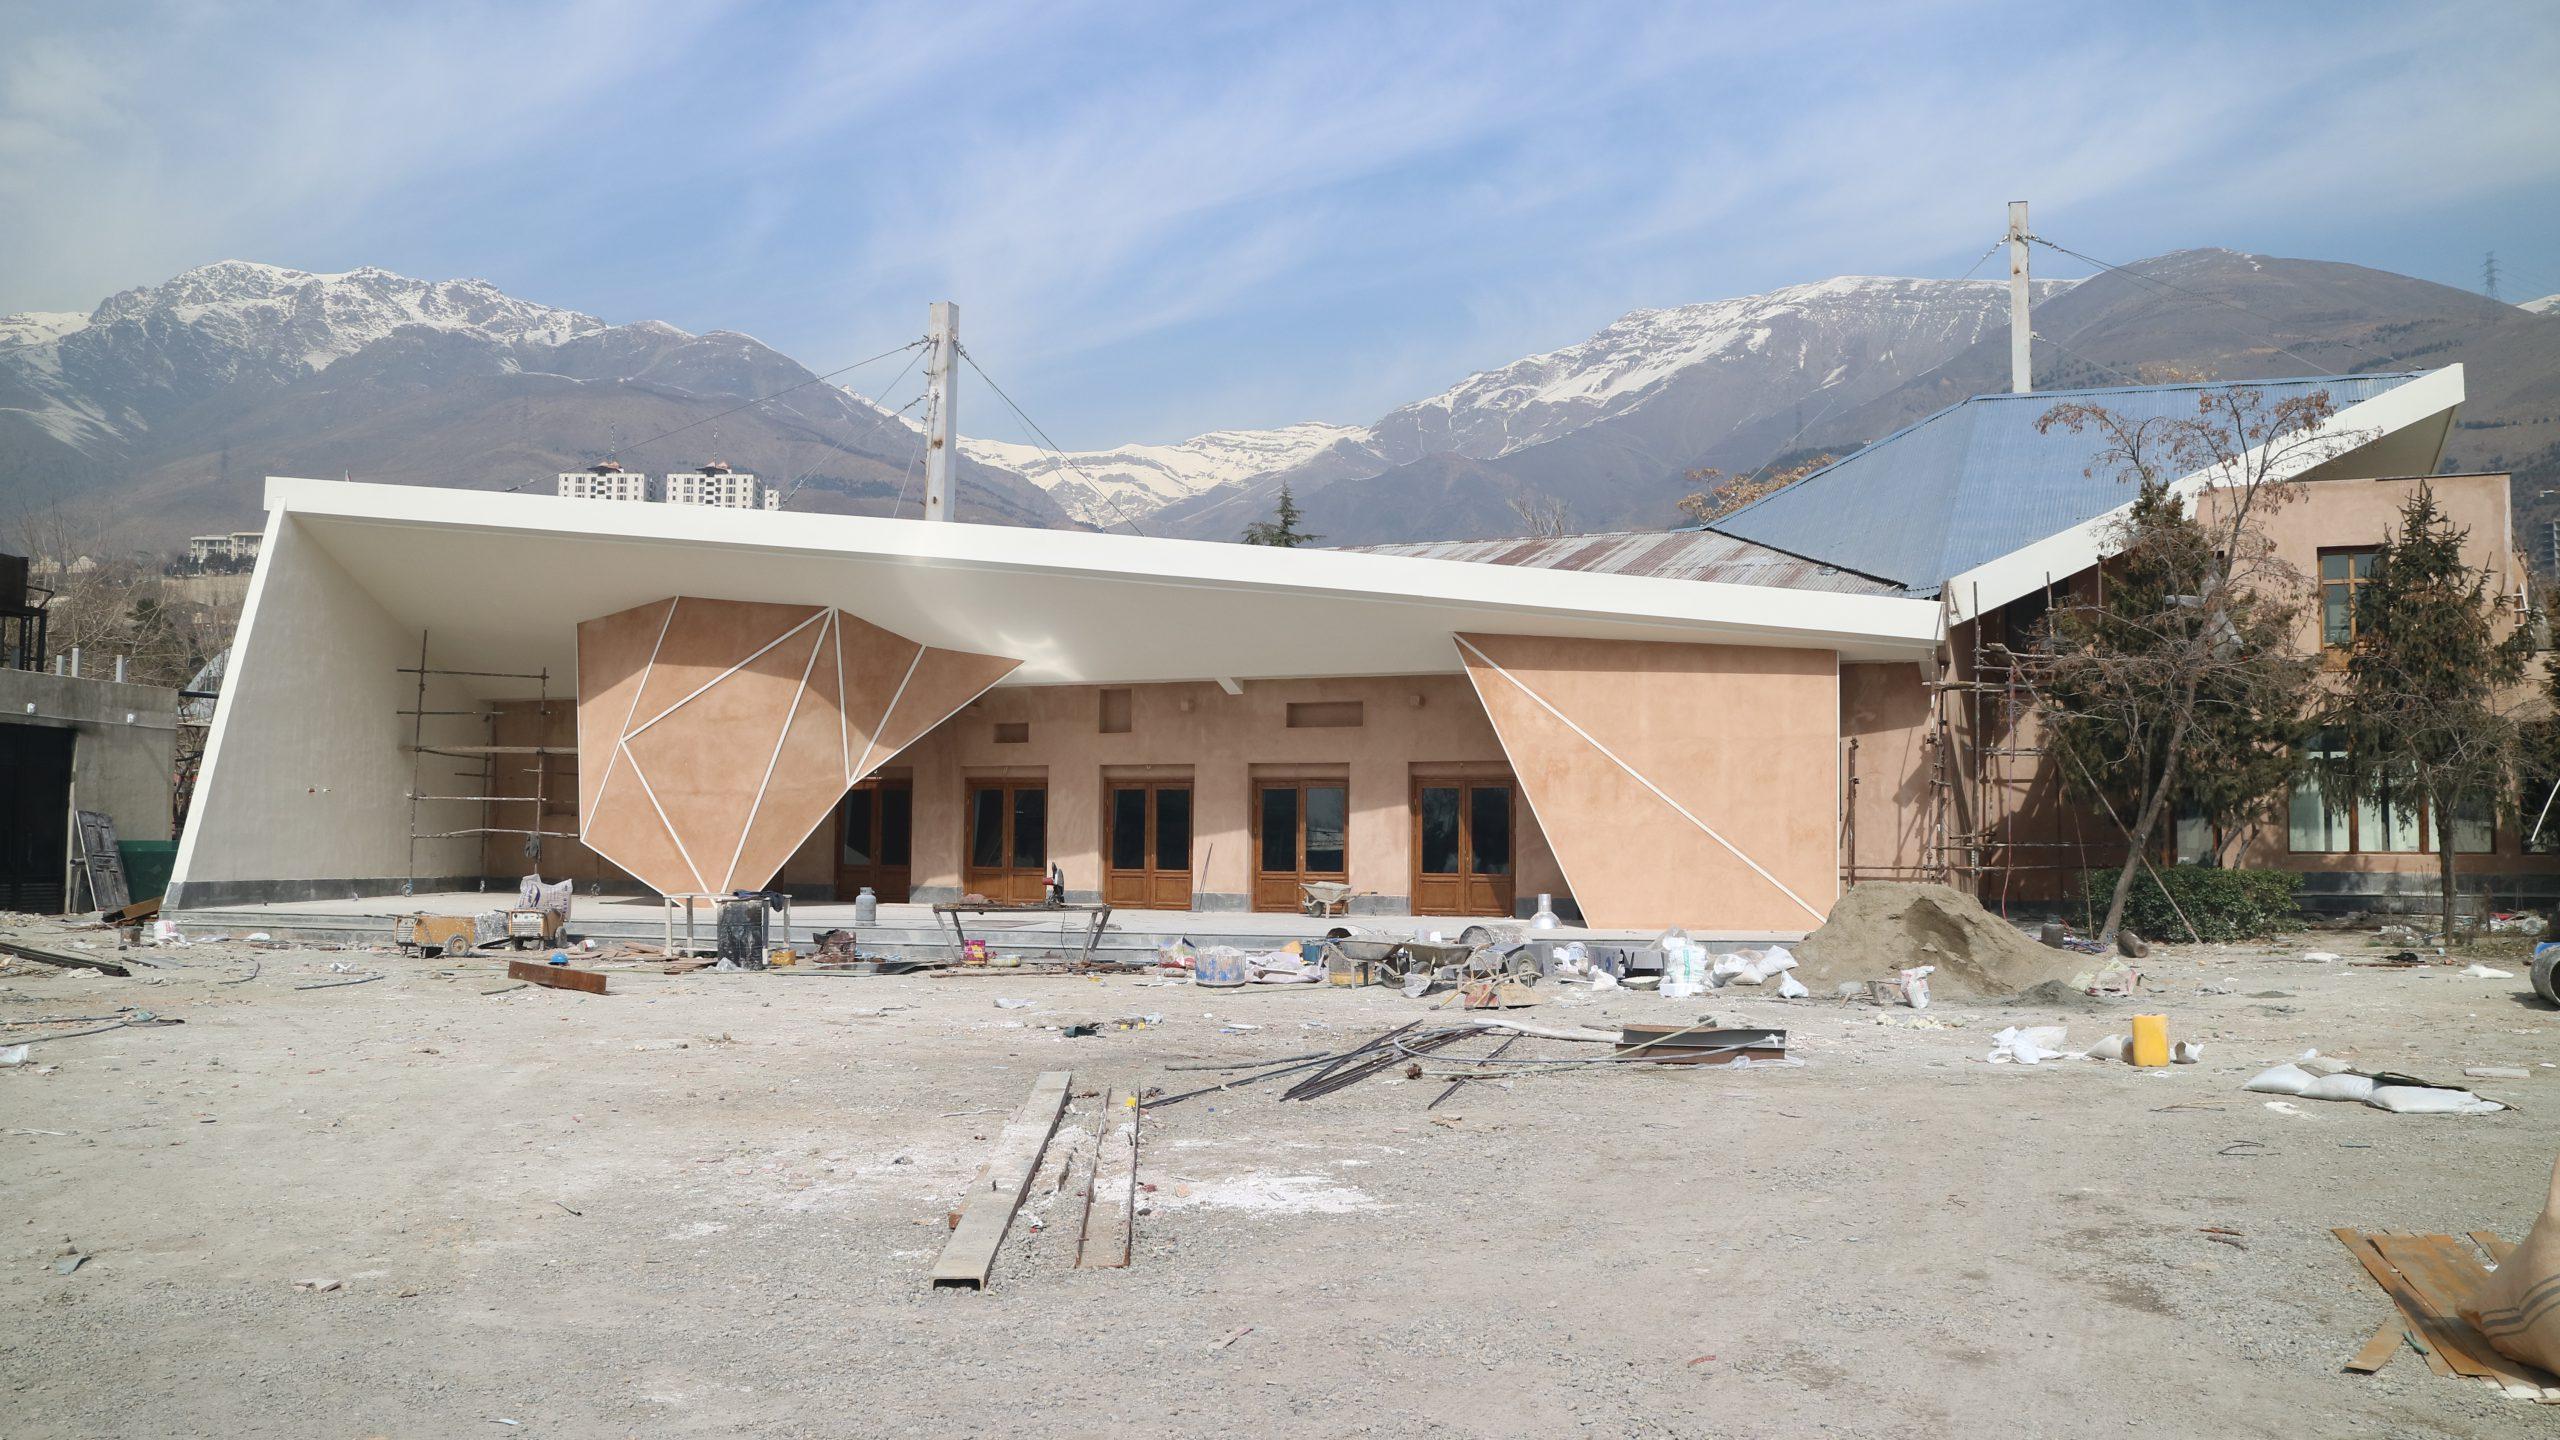 باهمستان، میزبان سکوی پرتاب زمستانی و رویداد نشانی